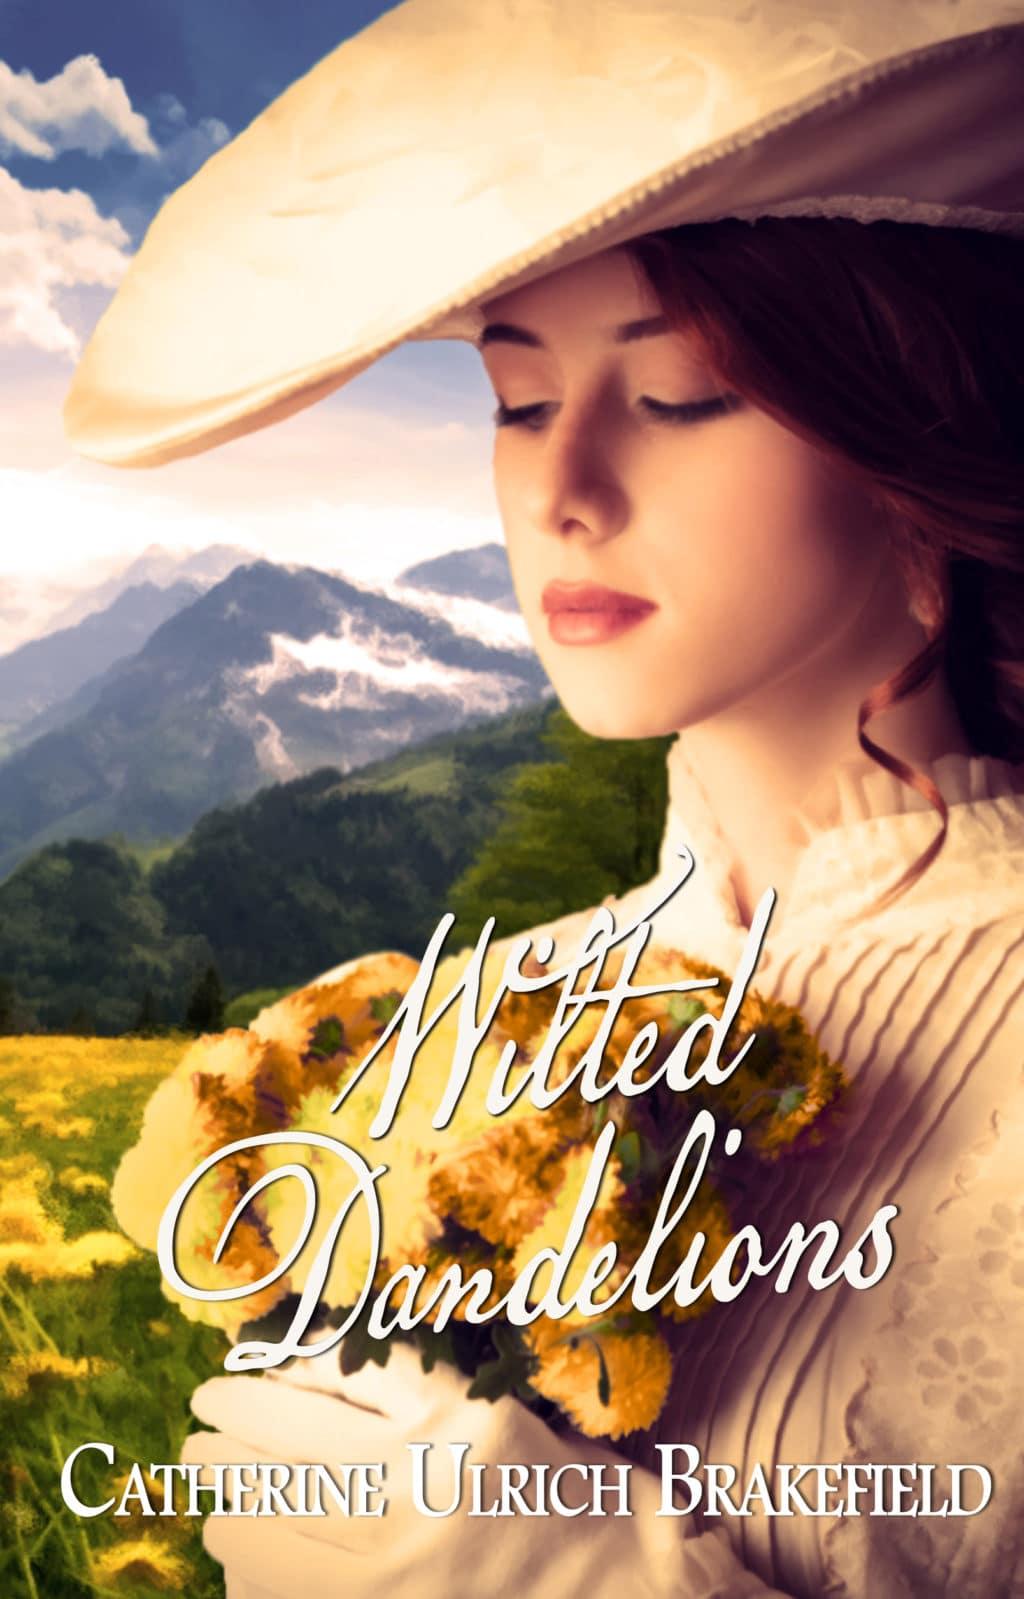 Dandelion Cover